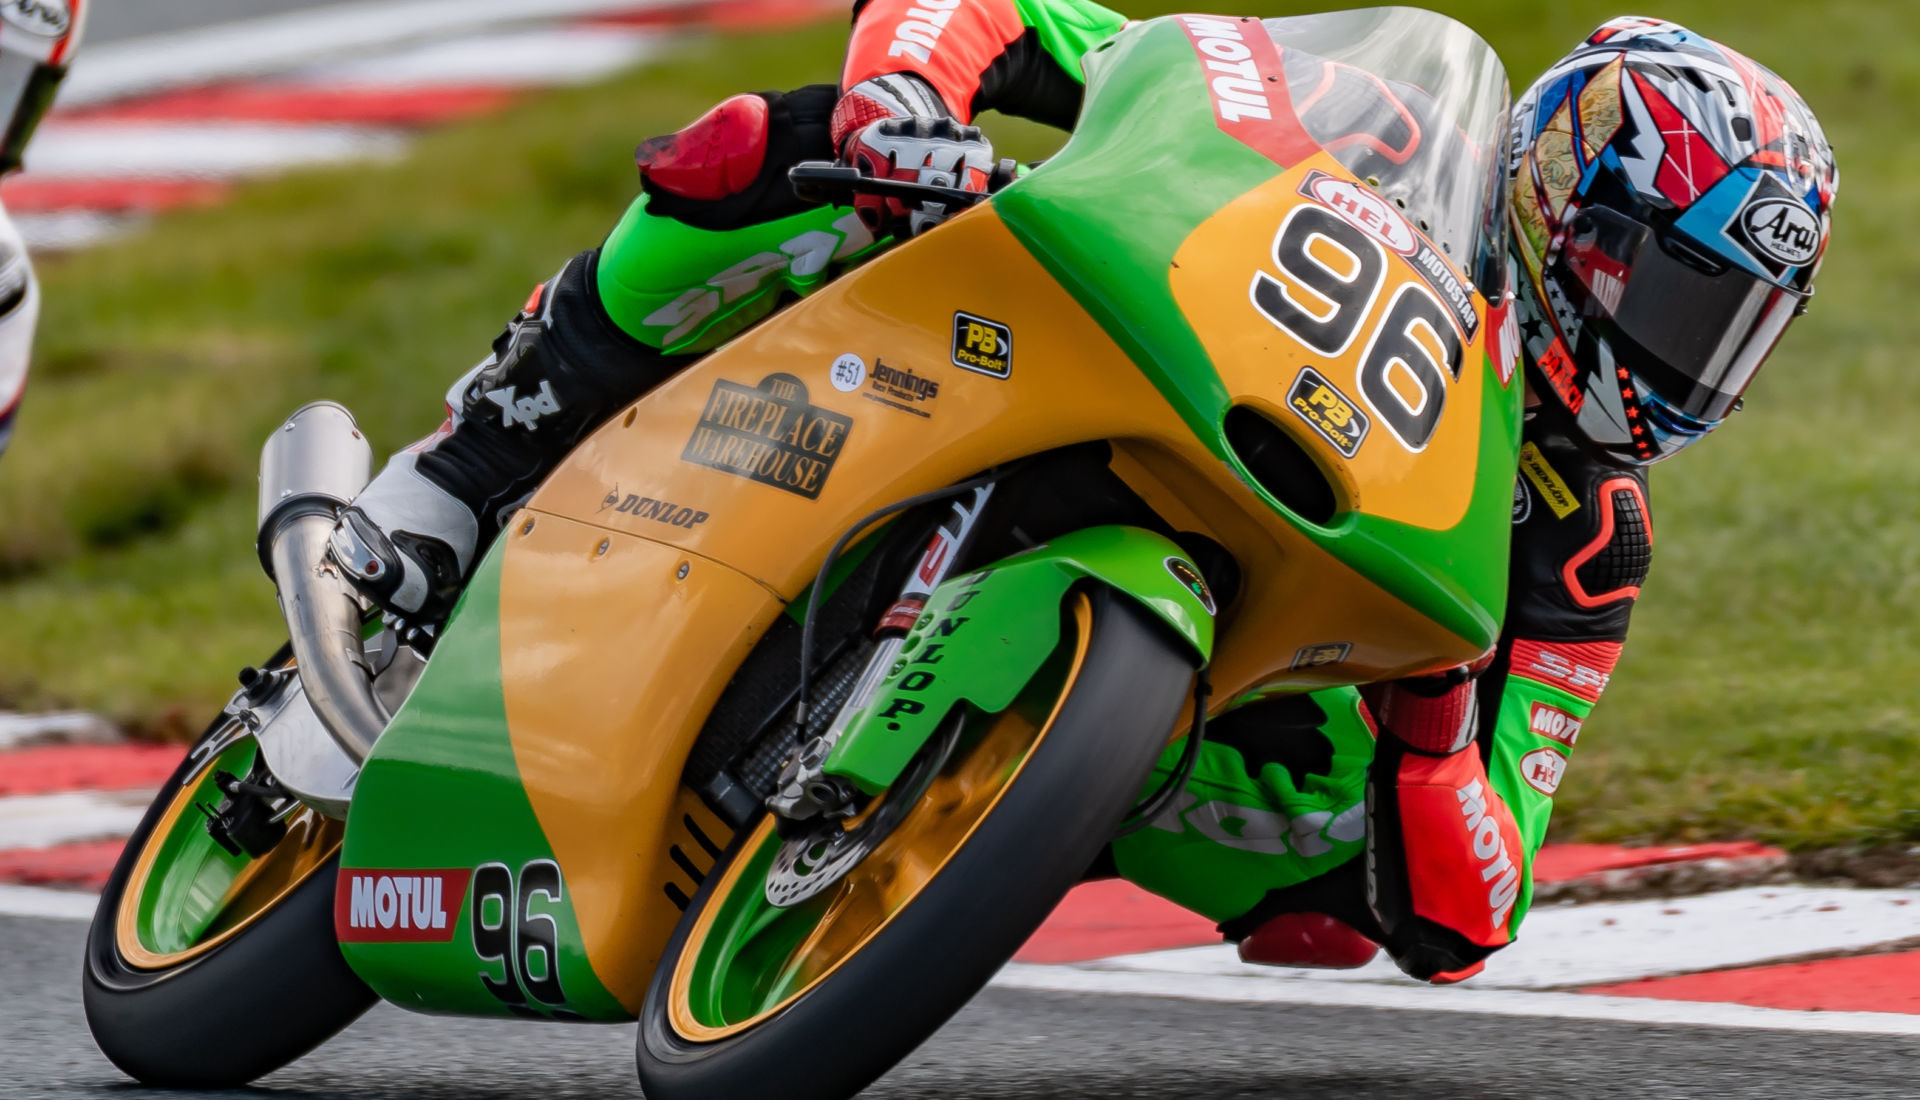 Brandon Paasch won both Motostar races RRW-